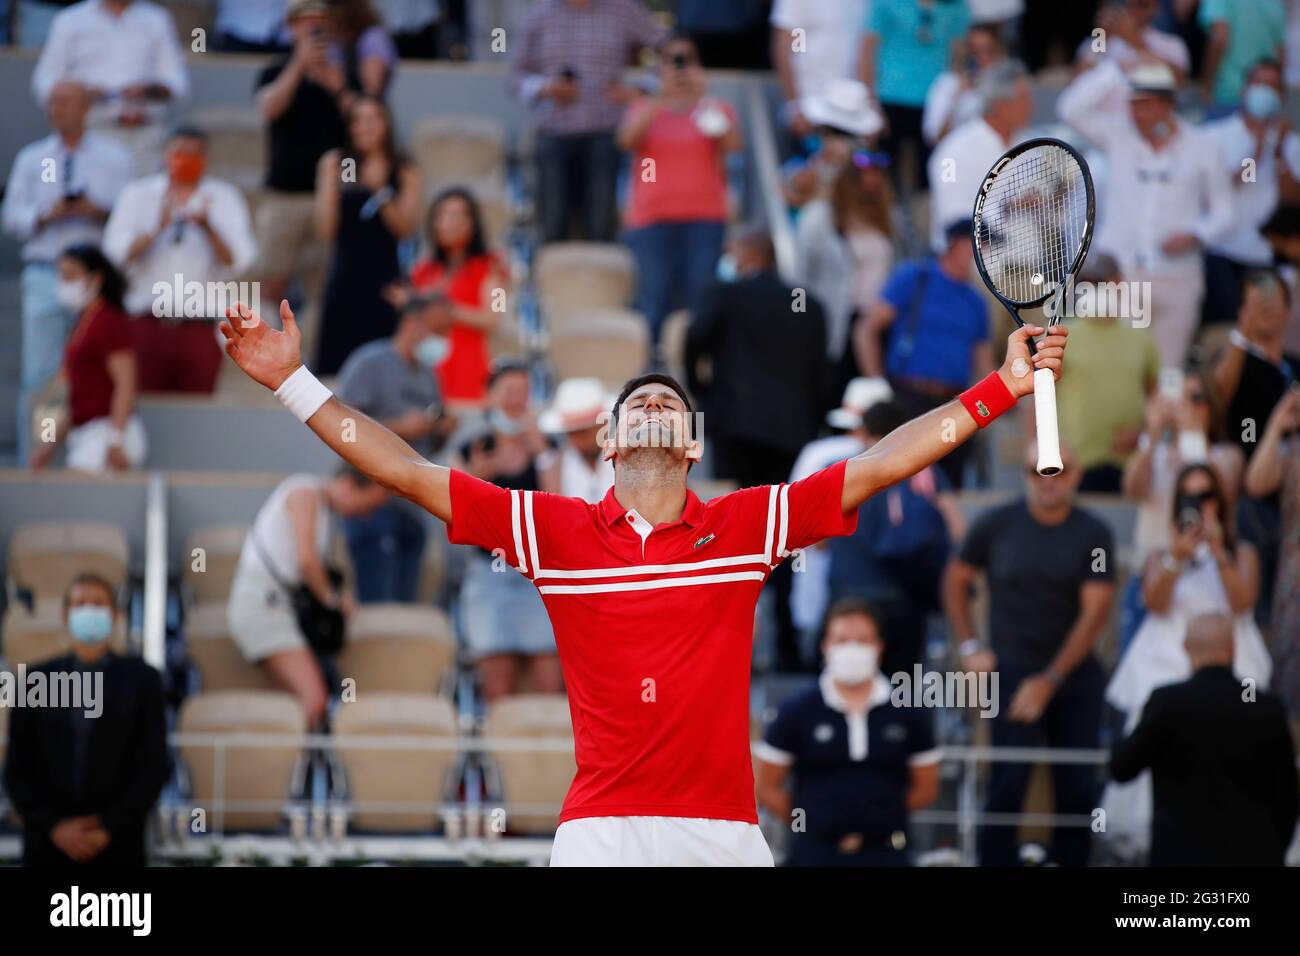 Tennis - French Open - Roland Garros, Parigi, Francia - 13 giugno 2021 la Serbia Novak Djokovic celebra la vittoria finale contro Stefanos Tsitsipas REUTERS/Gonzalo Fuentes Foto Stock